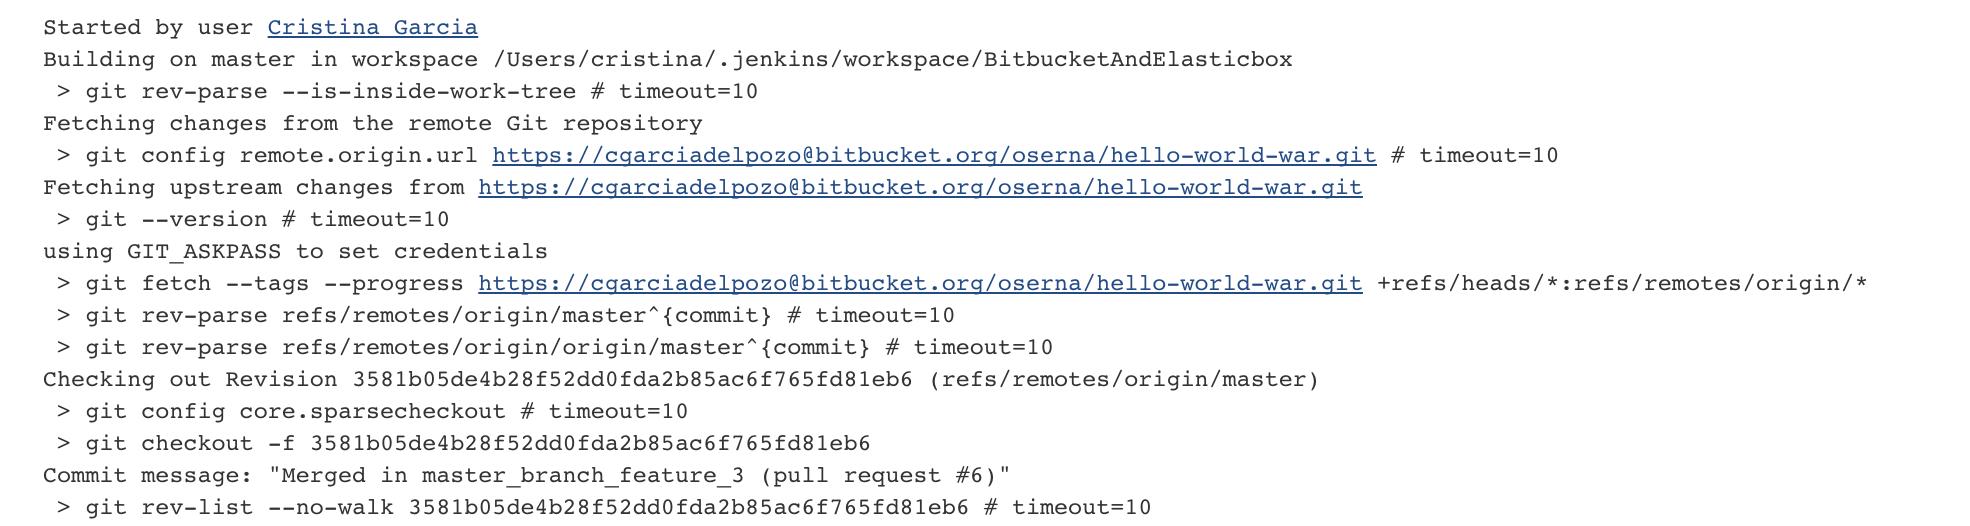 jenkins-bitbucket-19.png